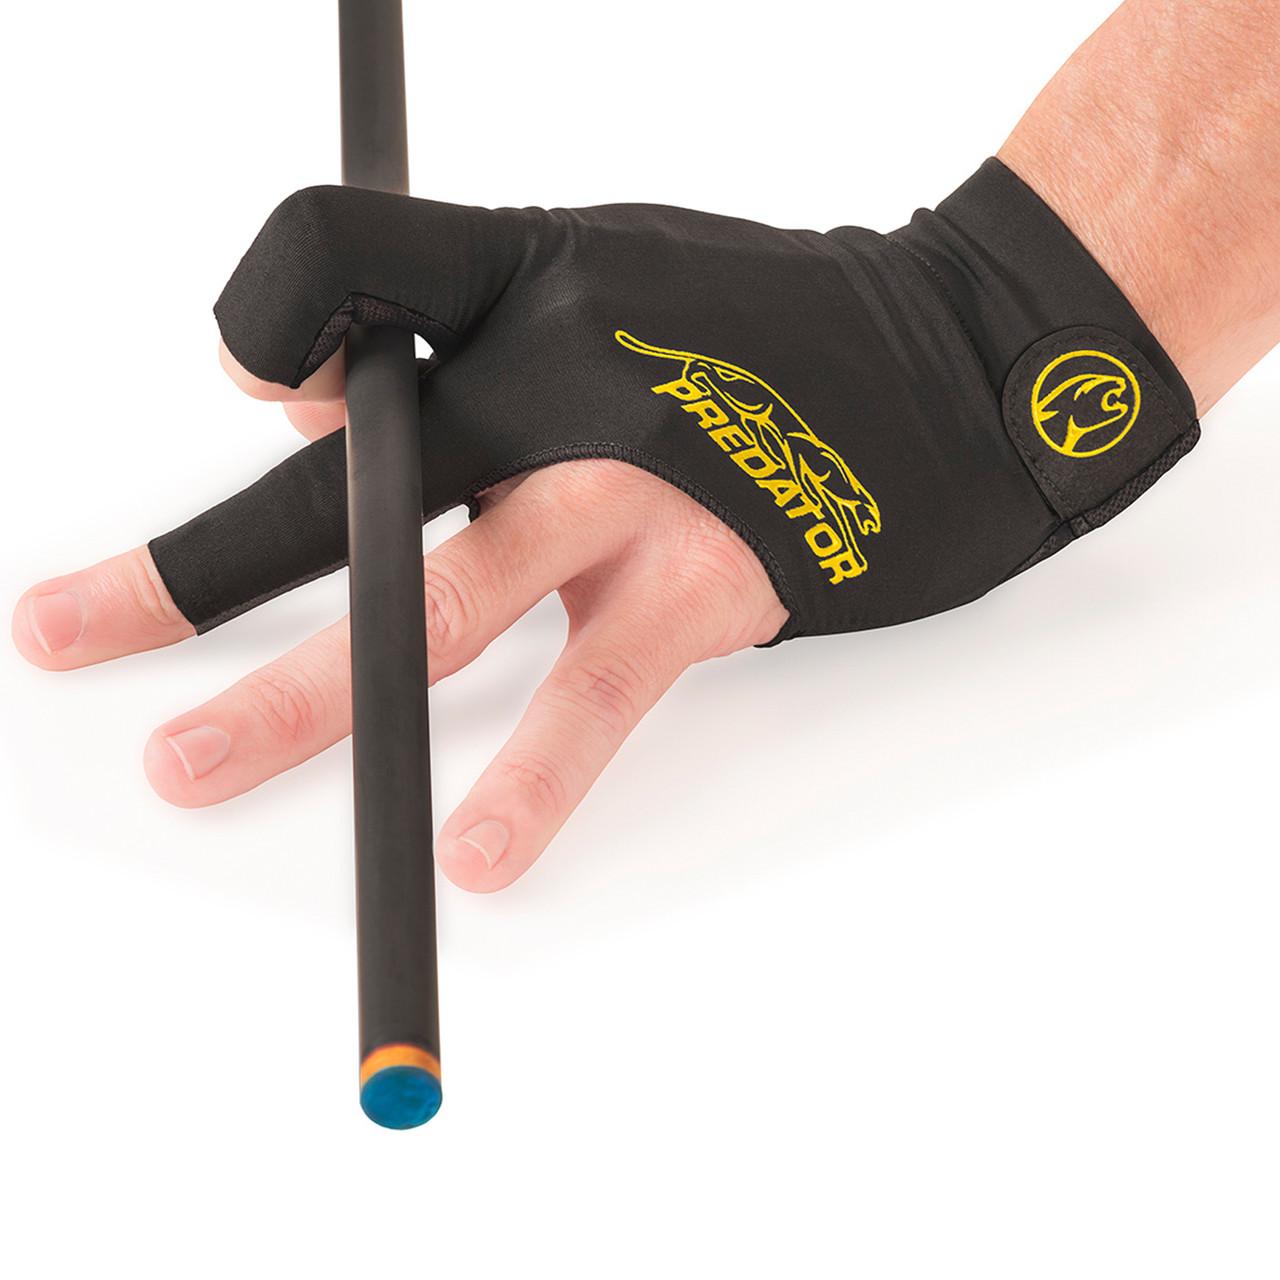 Predator Second Skin Pool Glove - Thumb